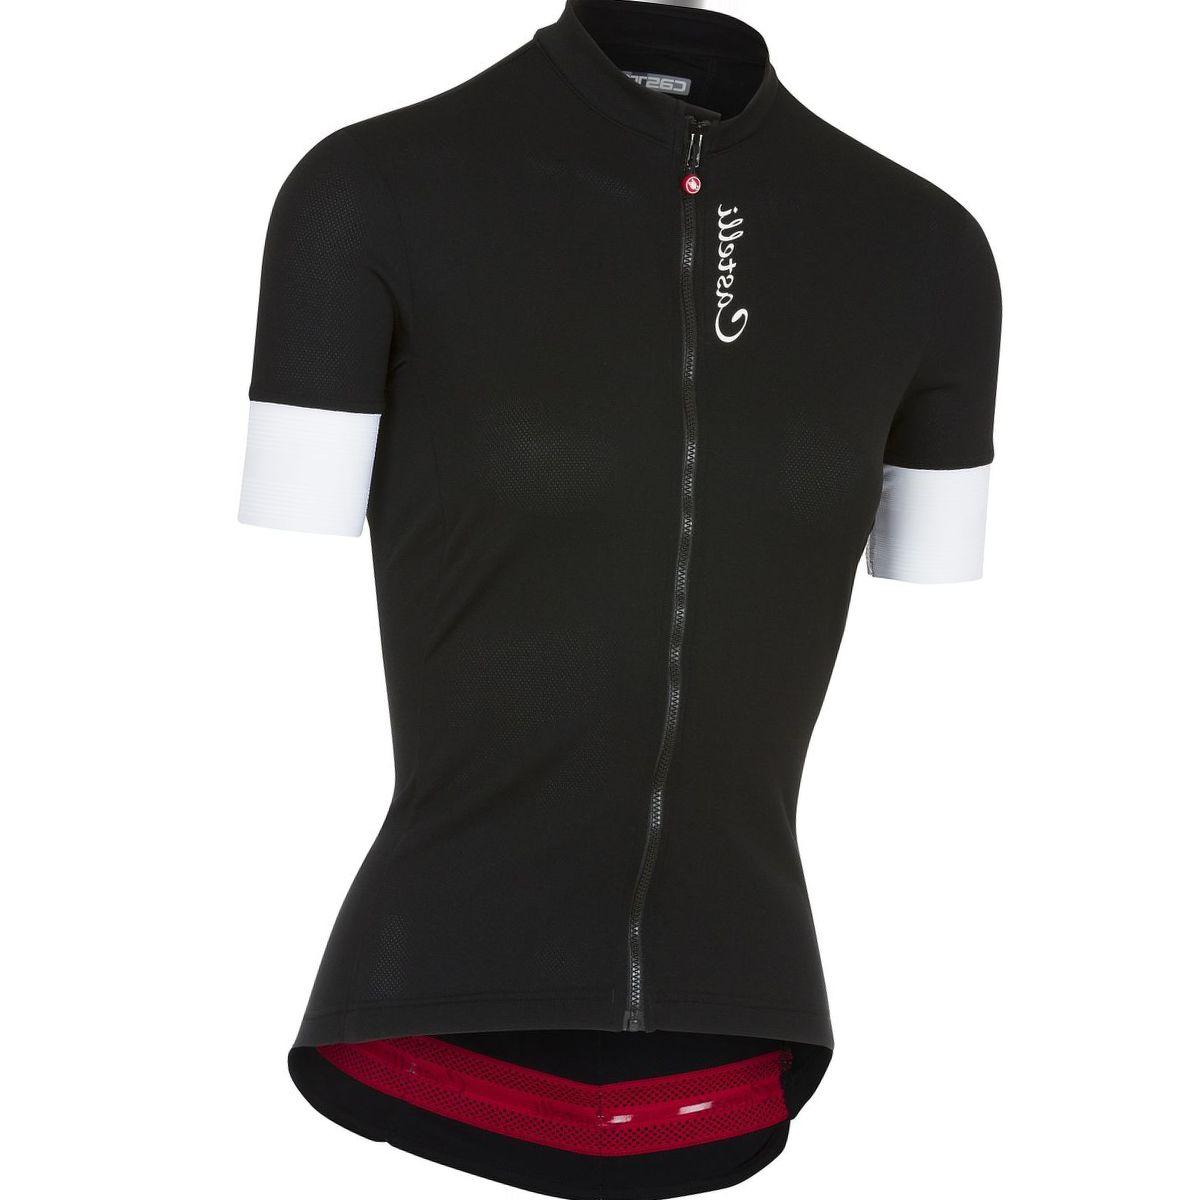 Castelli Anima 2 Full-Zip Jersey - Women's